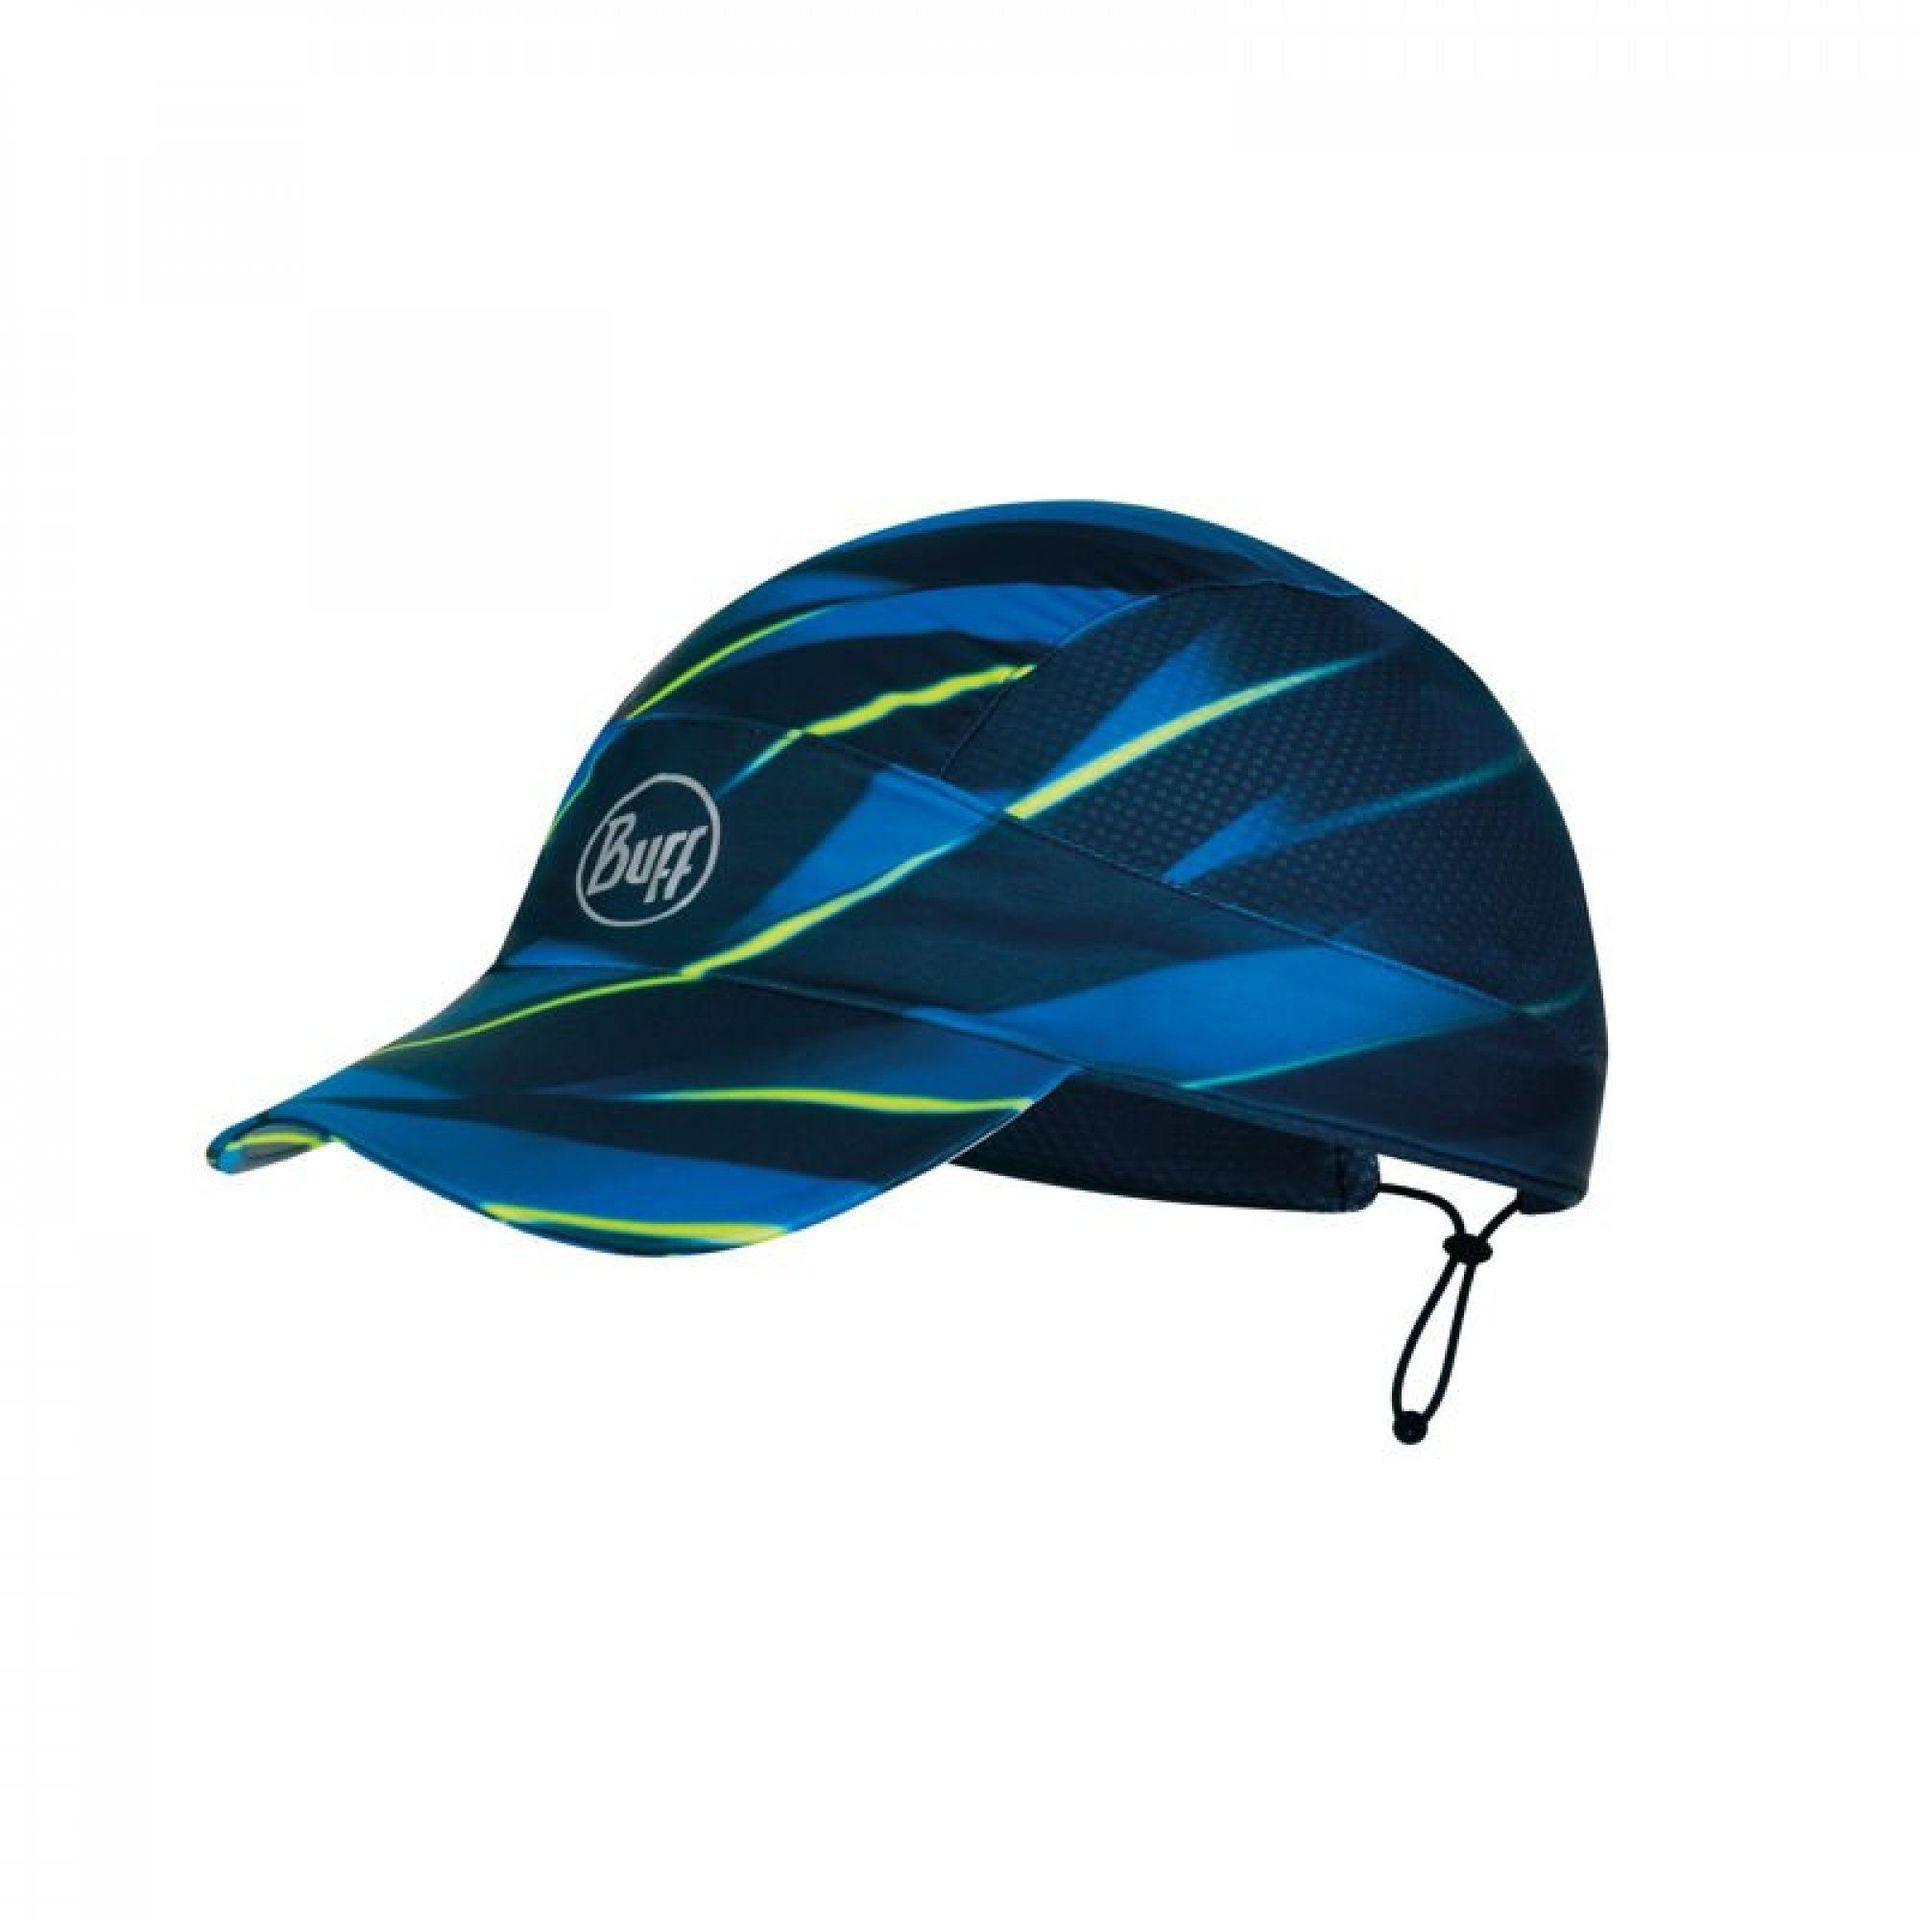 PACK RUN CAP R-FOCUS BLUE 1